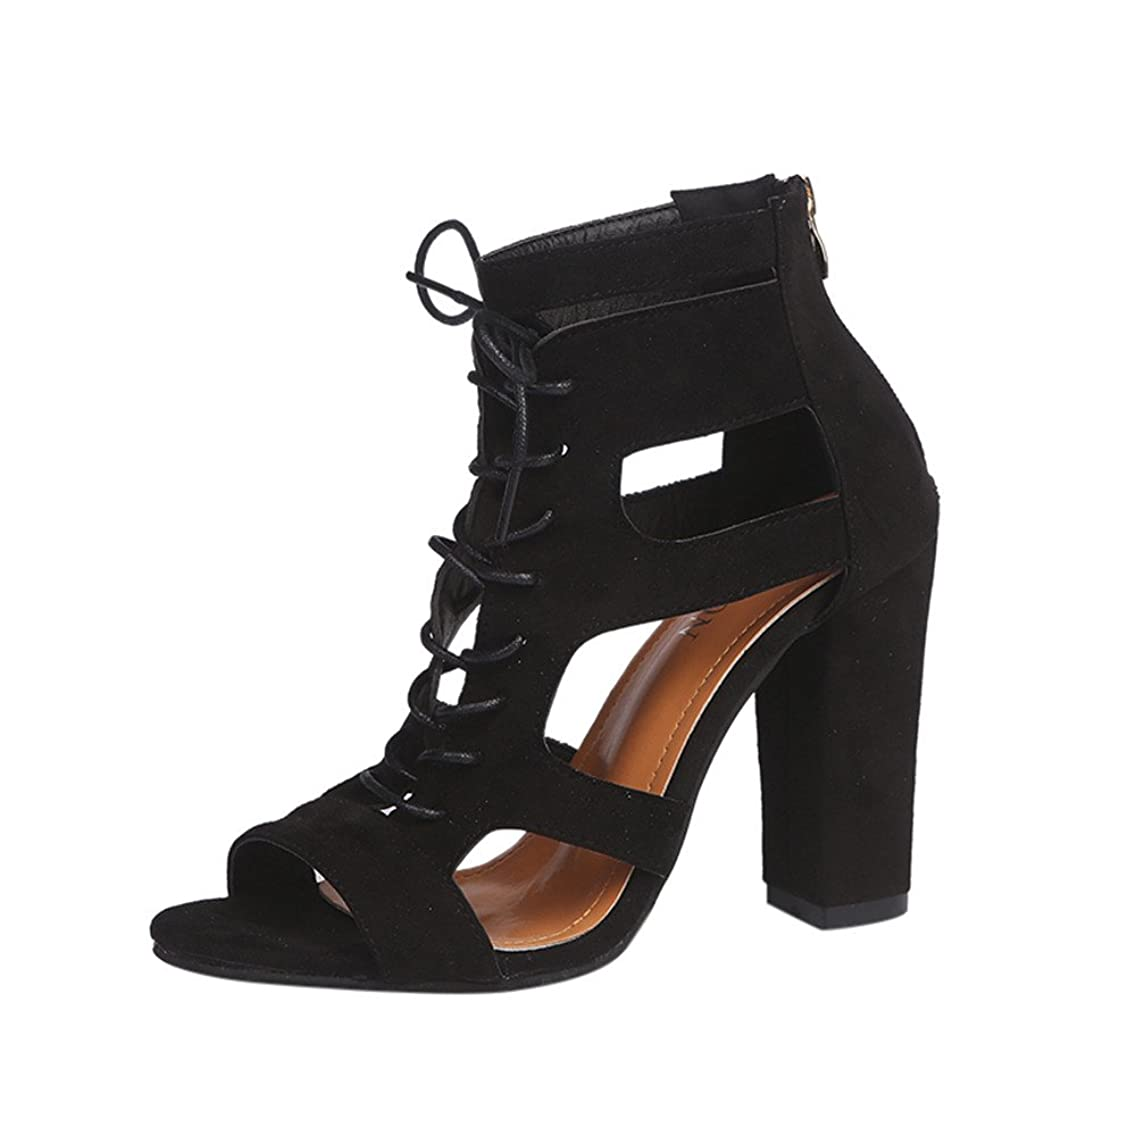 Nevera Women's High Heel Sandals Open Toe Ankle Strap Cutout Lace Up Block Heel Platform Shoes